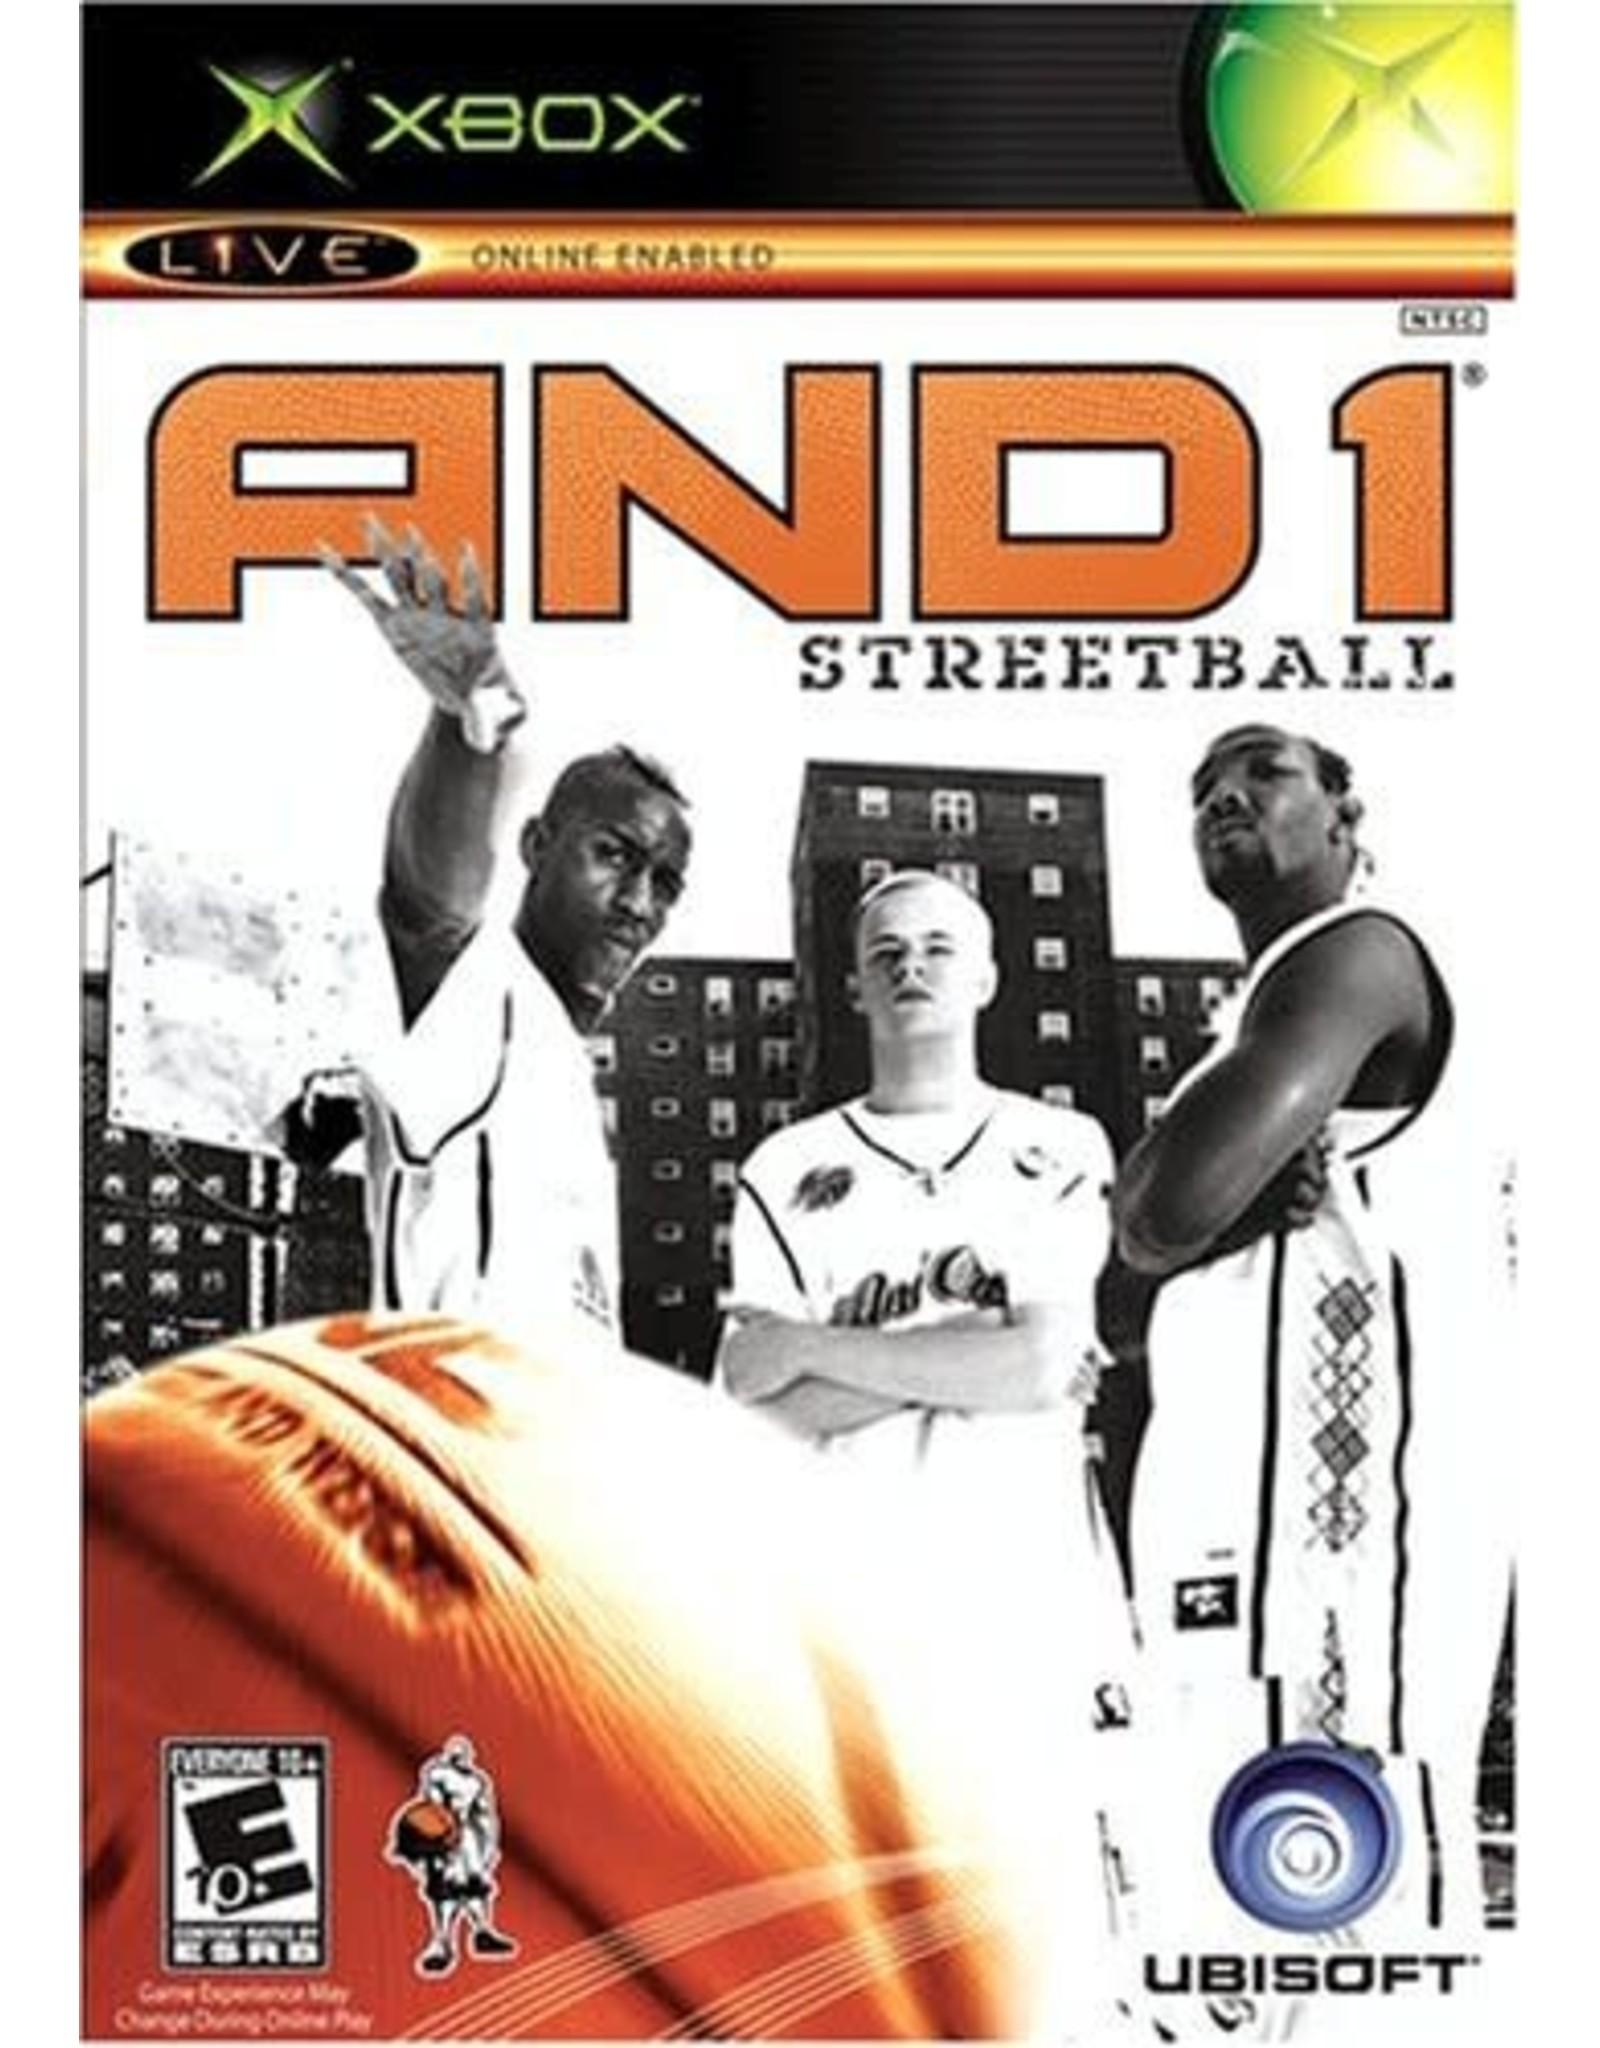 Xbox And 1 Streetball (CiB)